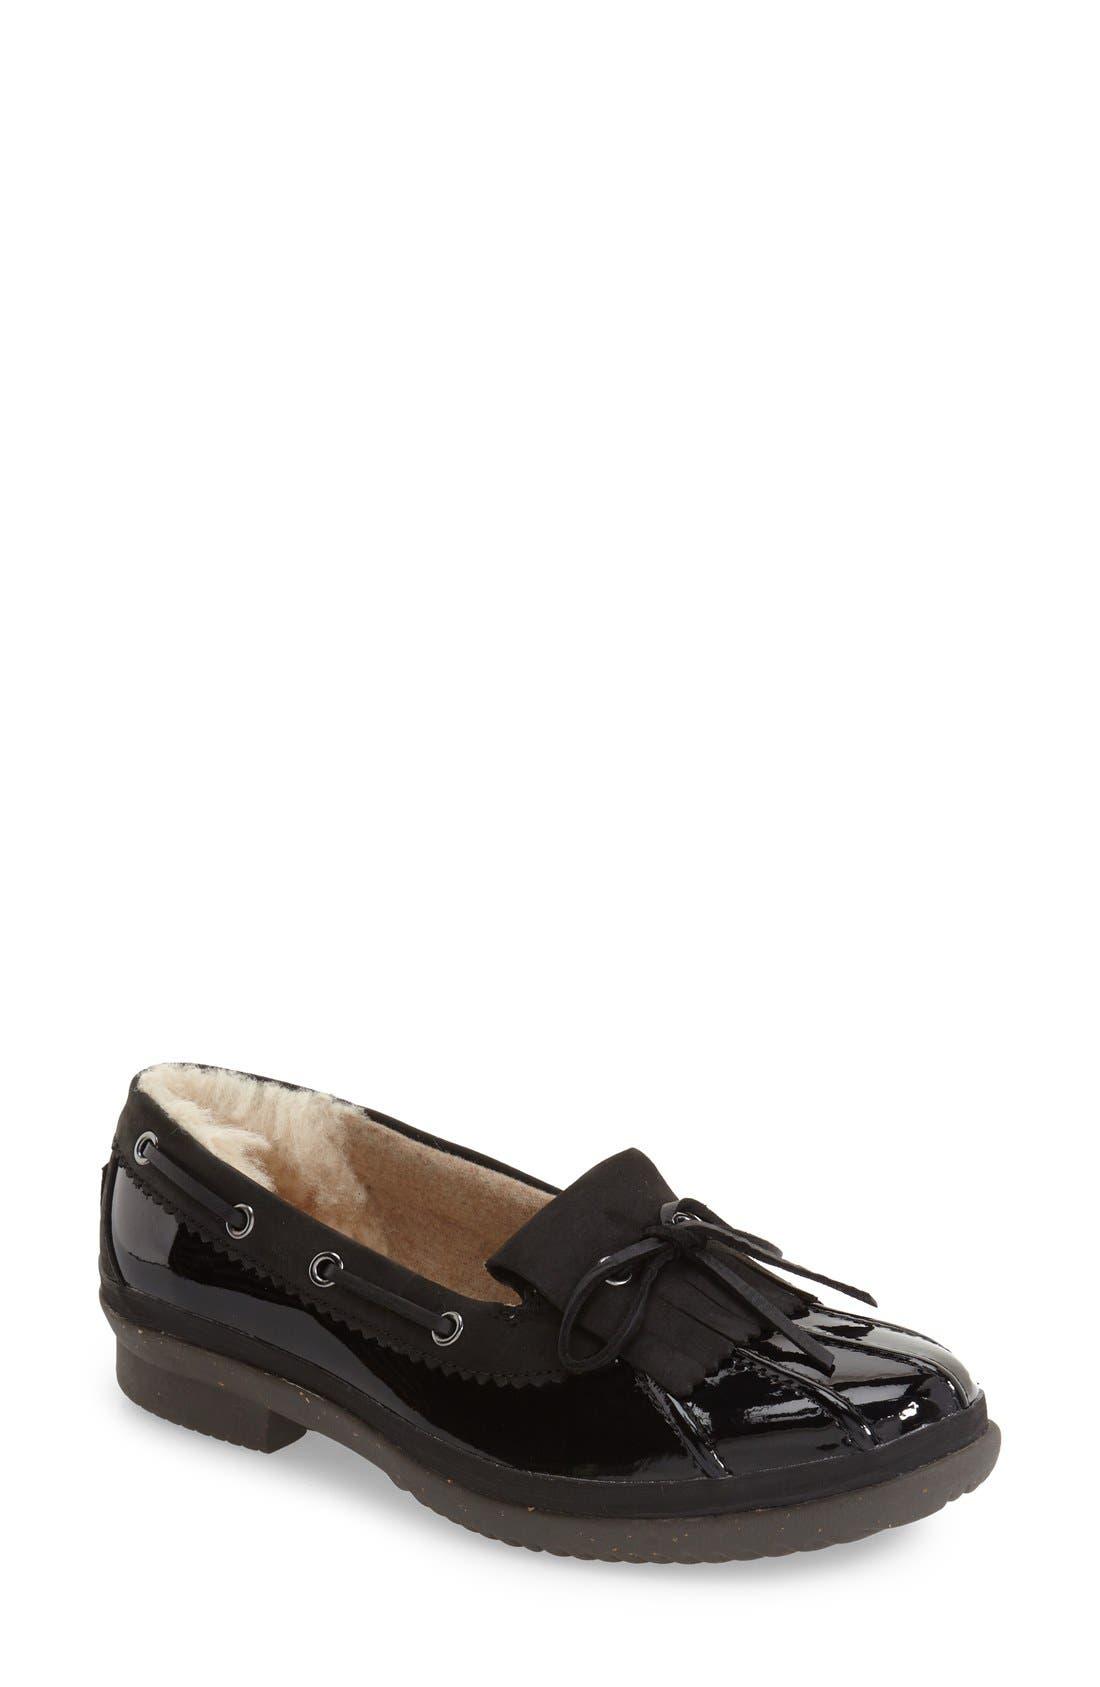 Main Image - UGG® Haylie Waterproof Loafer (Women)